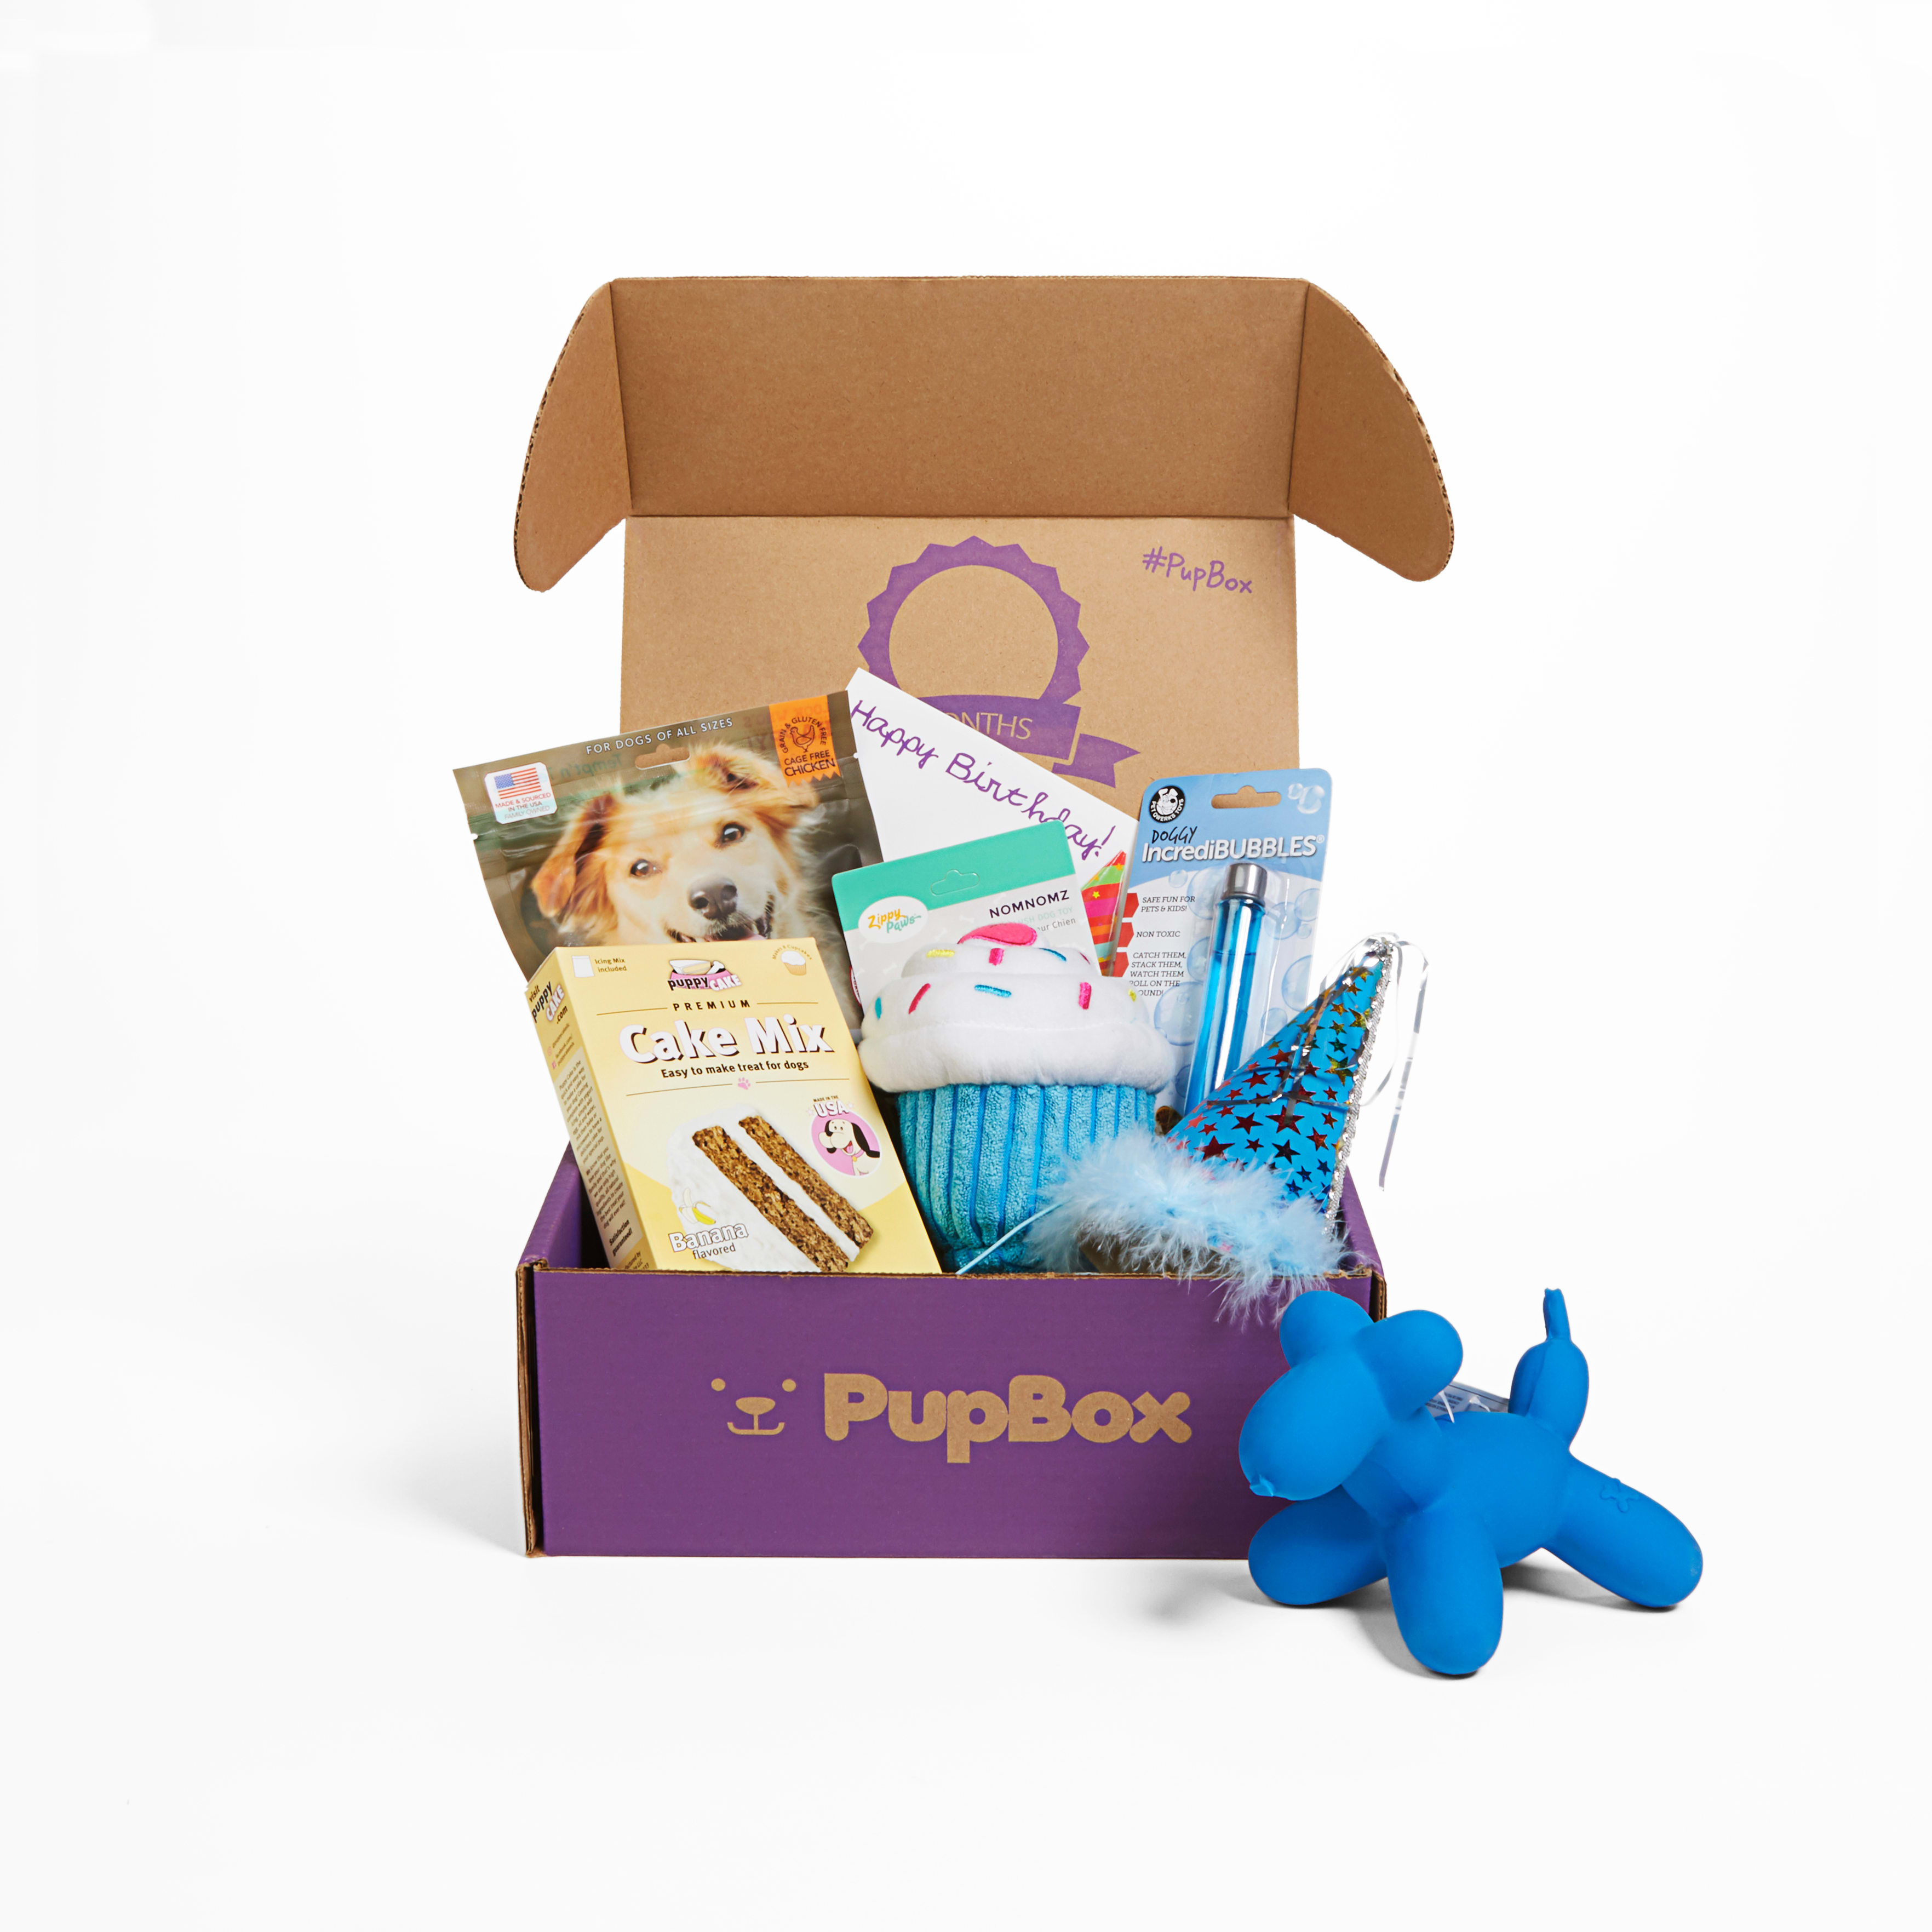 Incredible Birthday Boy Puppy Dog Subscription Boxes Pupbox At Petco Personalised Birthday Cards Arneslily Jamesorg